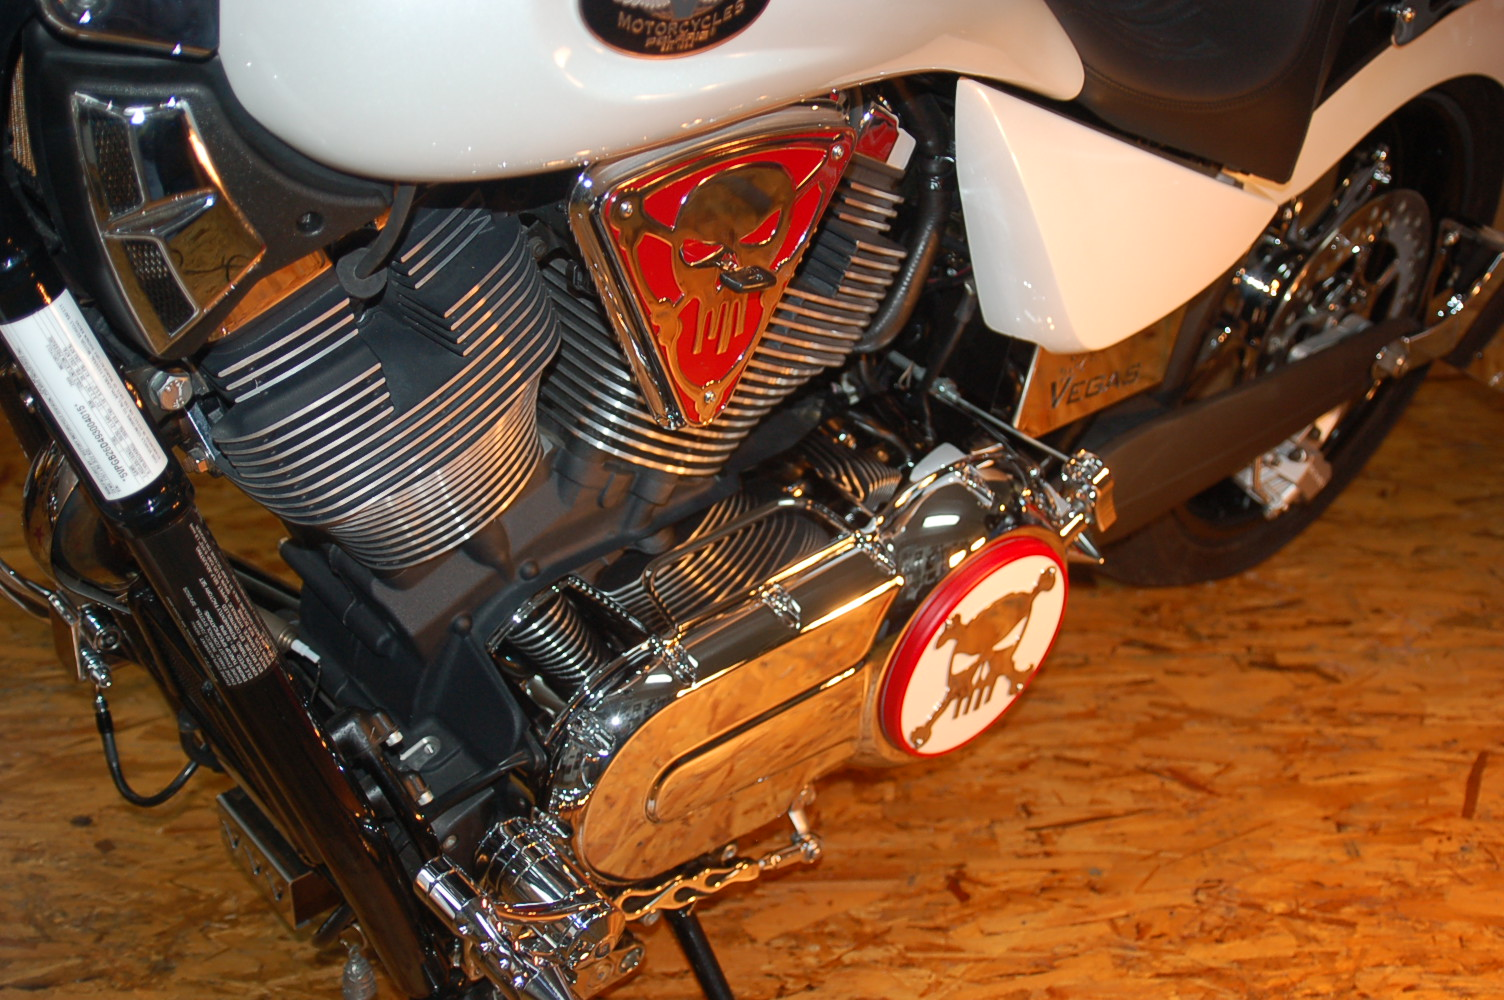 YV_5067] Victory Motorcycle Engine Diagram Wiring DiagramOnom Exxlu Inrebe Oidei Nful Mohammedshrine Librar Wiring 101